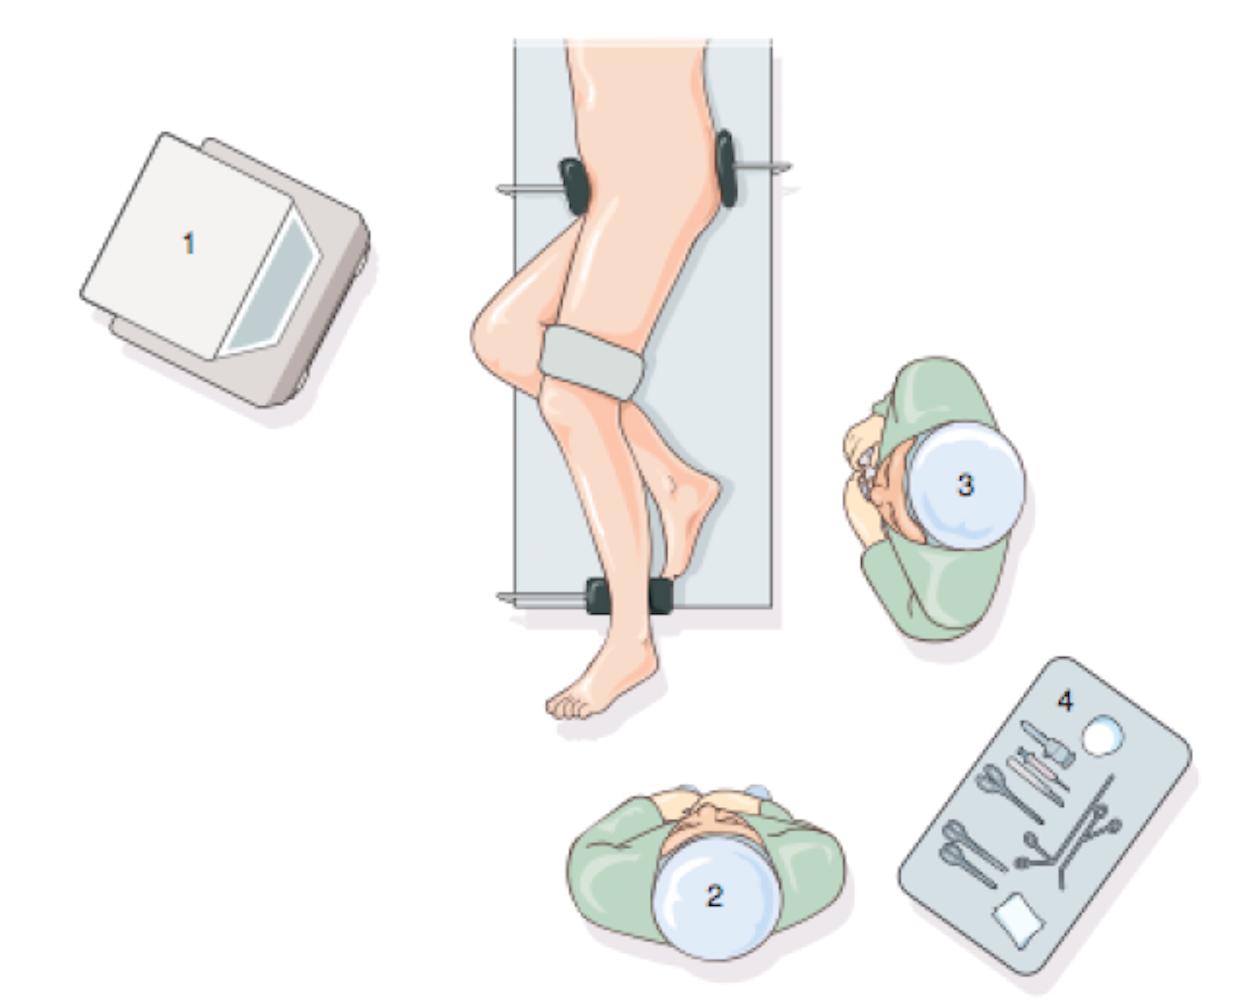 Tendinopathie des fibulaires : traitement par tendinoscopie